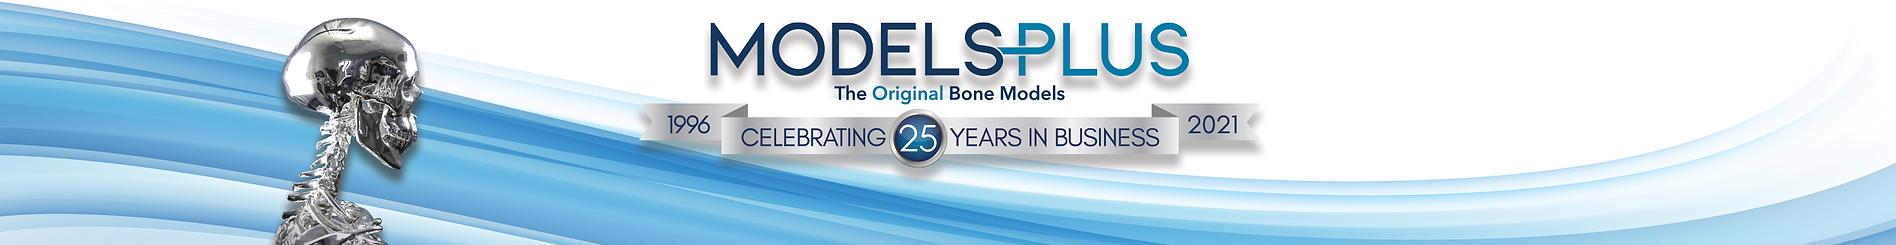 Models Plus | The Original Bone Models | Celebrating 25 Years in Business